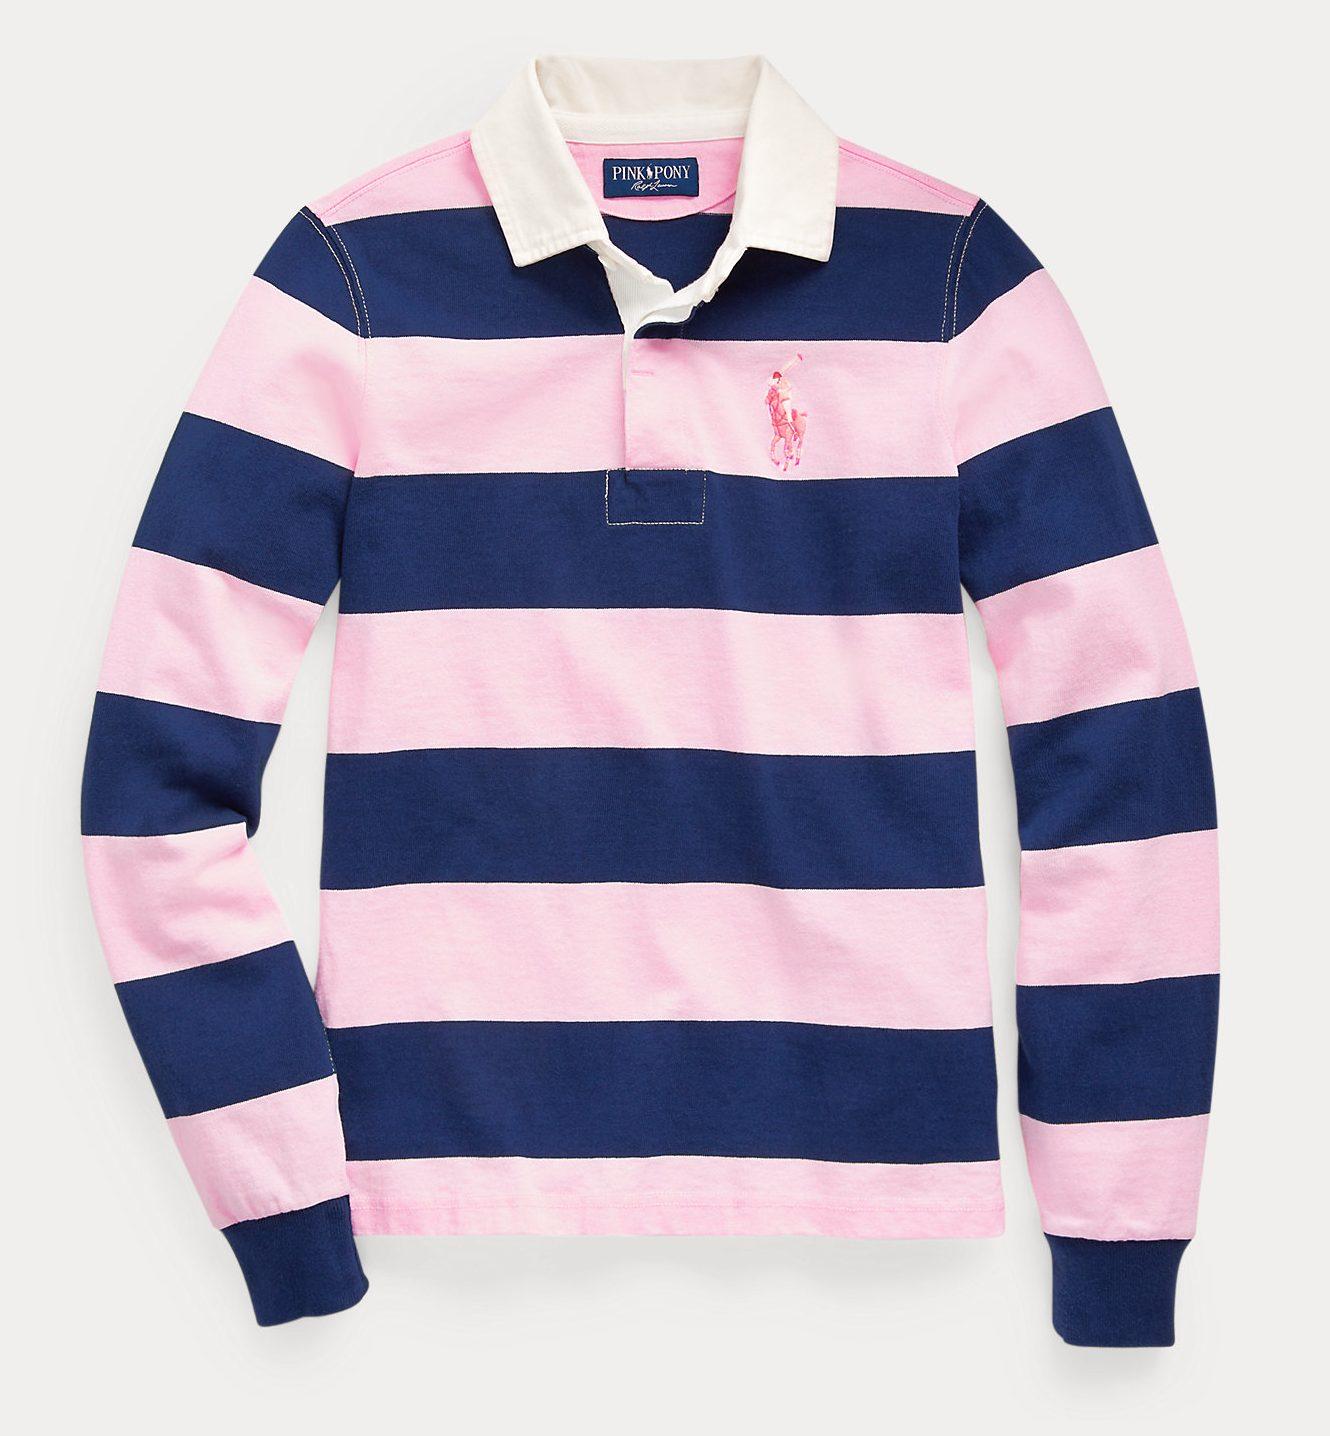 Ralph Lauren Pink Pony Rugby Shirt